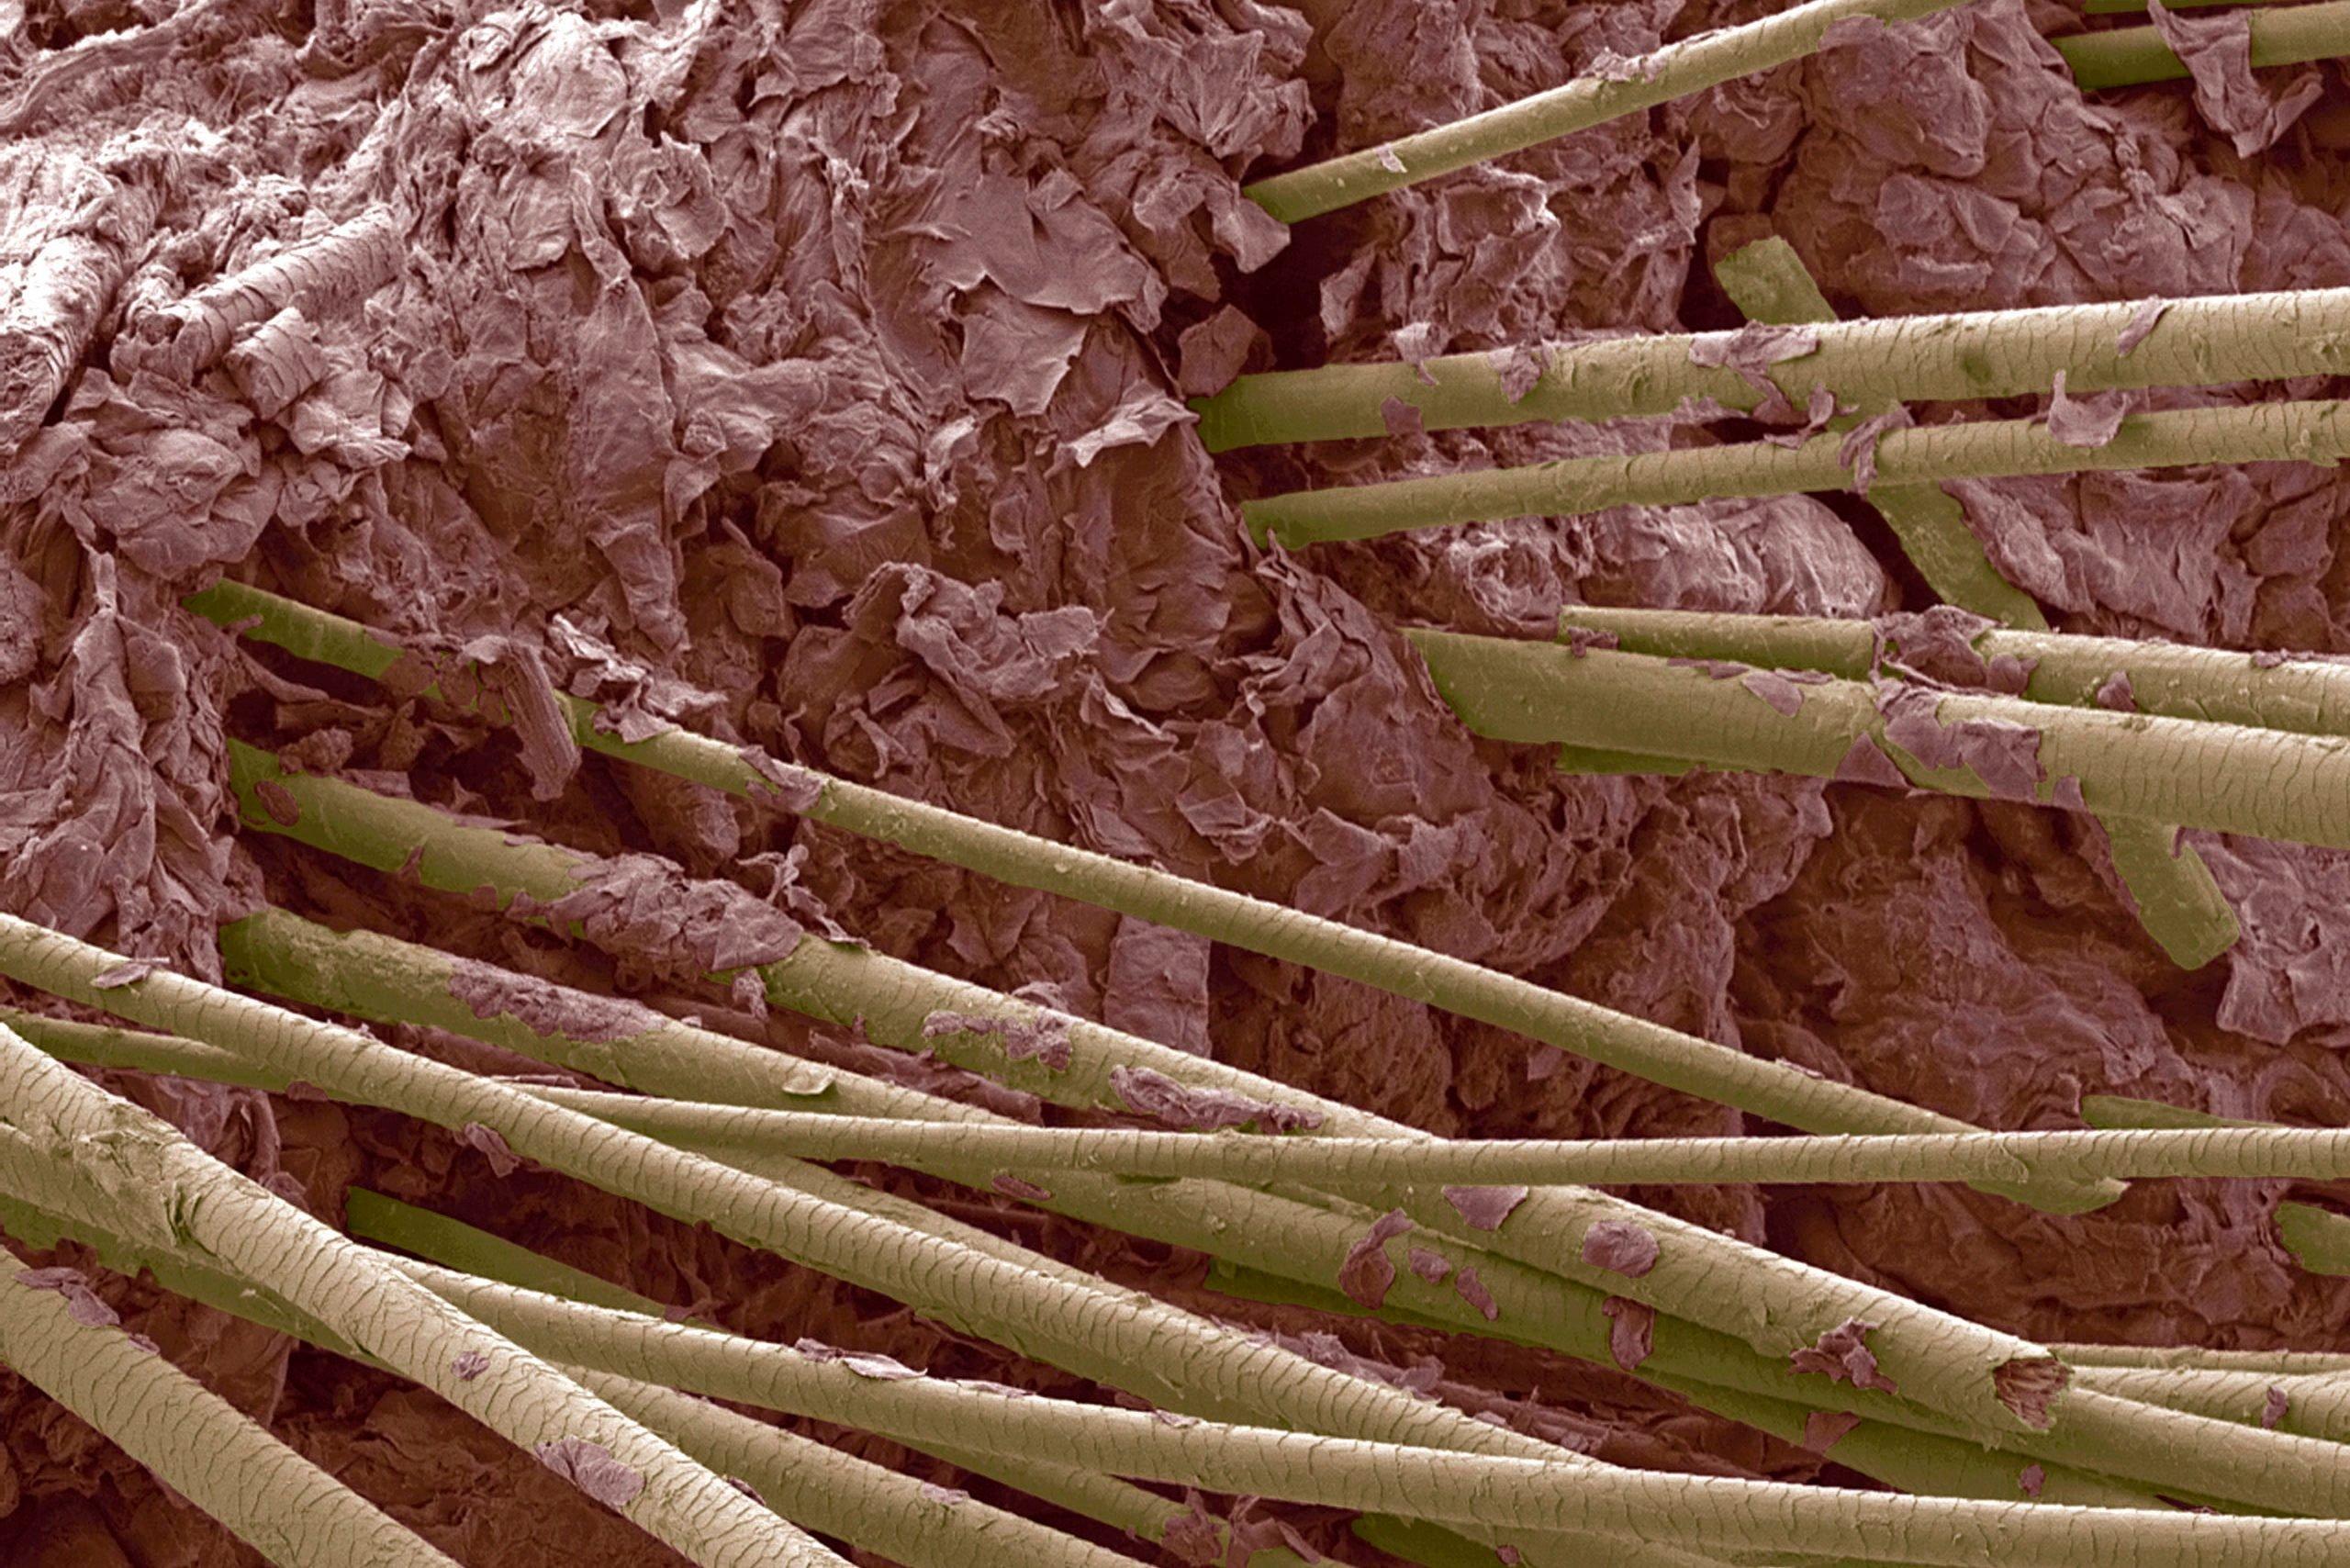 Human hair, close-up